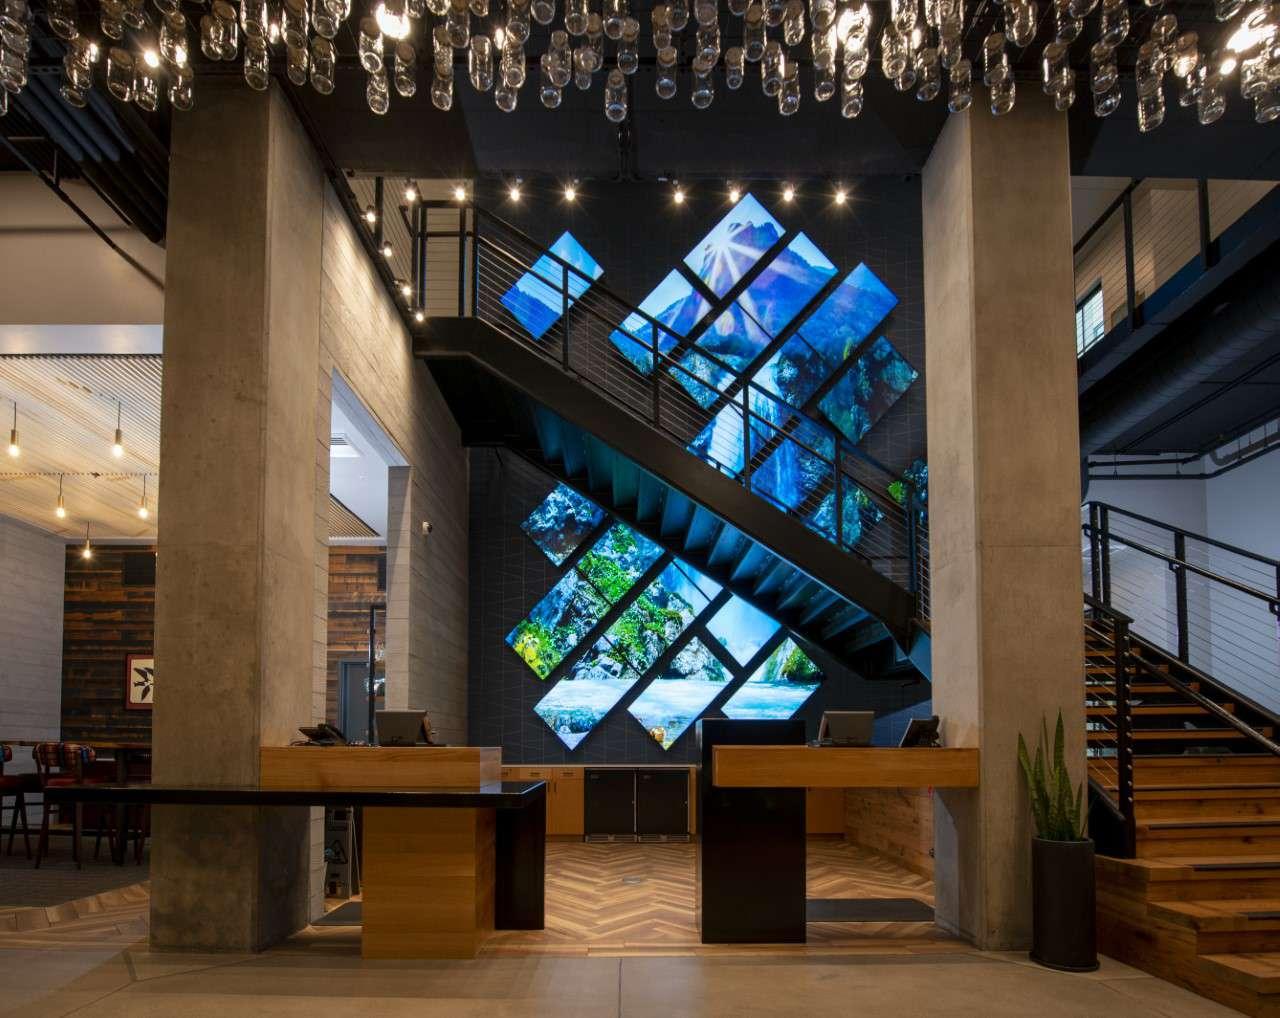 Gordon Hotel art installation